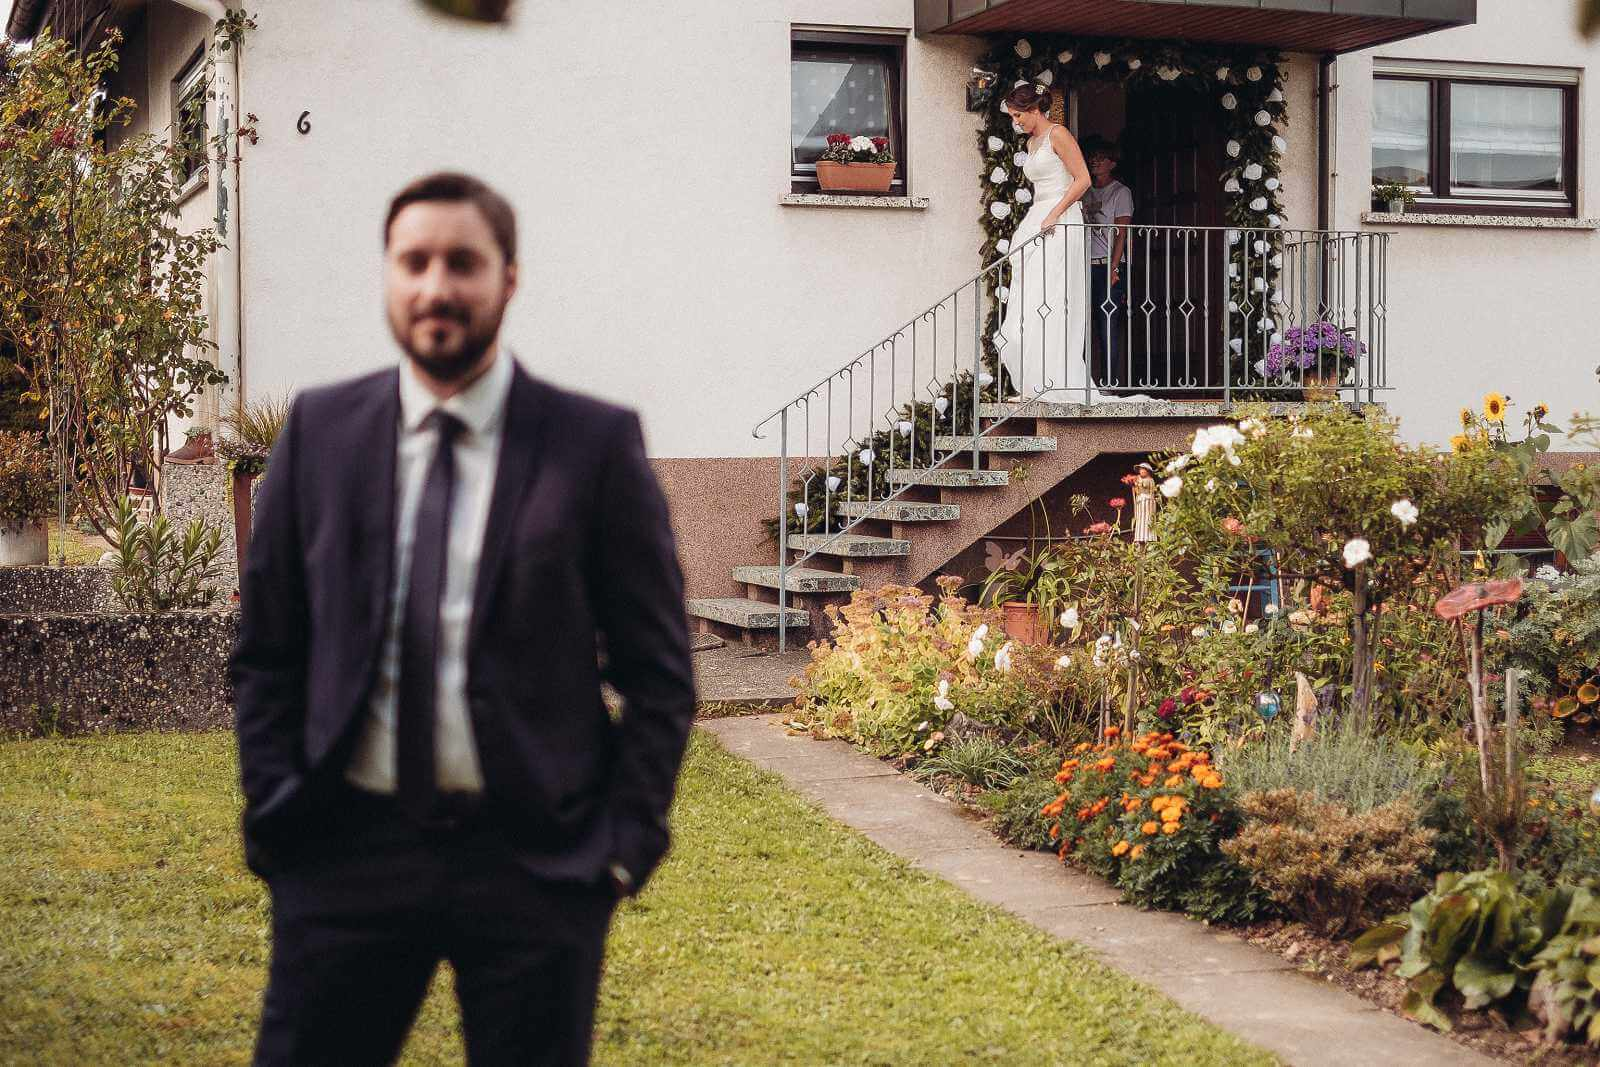 Hochzeitsfotograf Offenburg Zell am Harmersbach Bärenkeller (12)